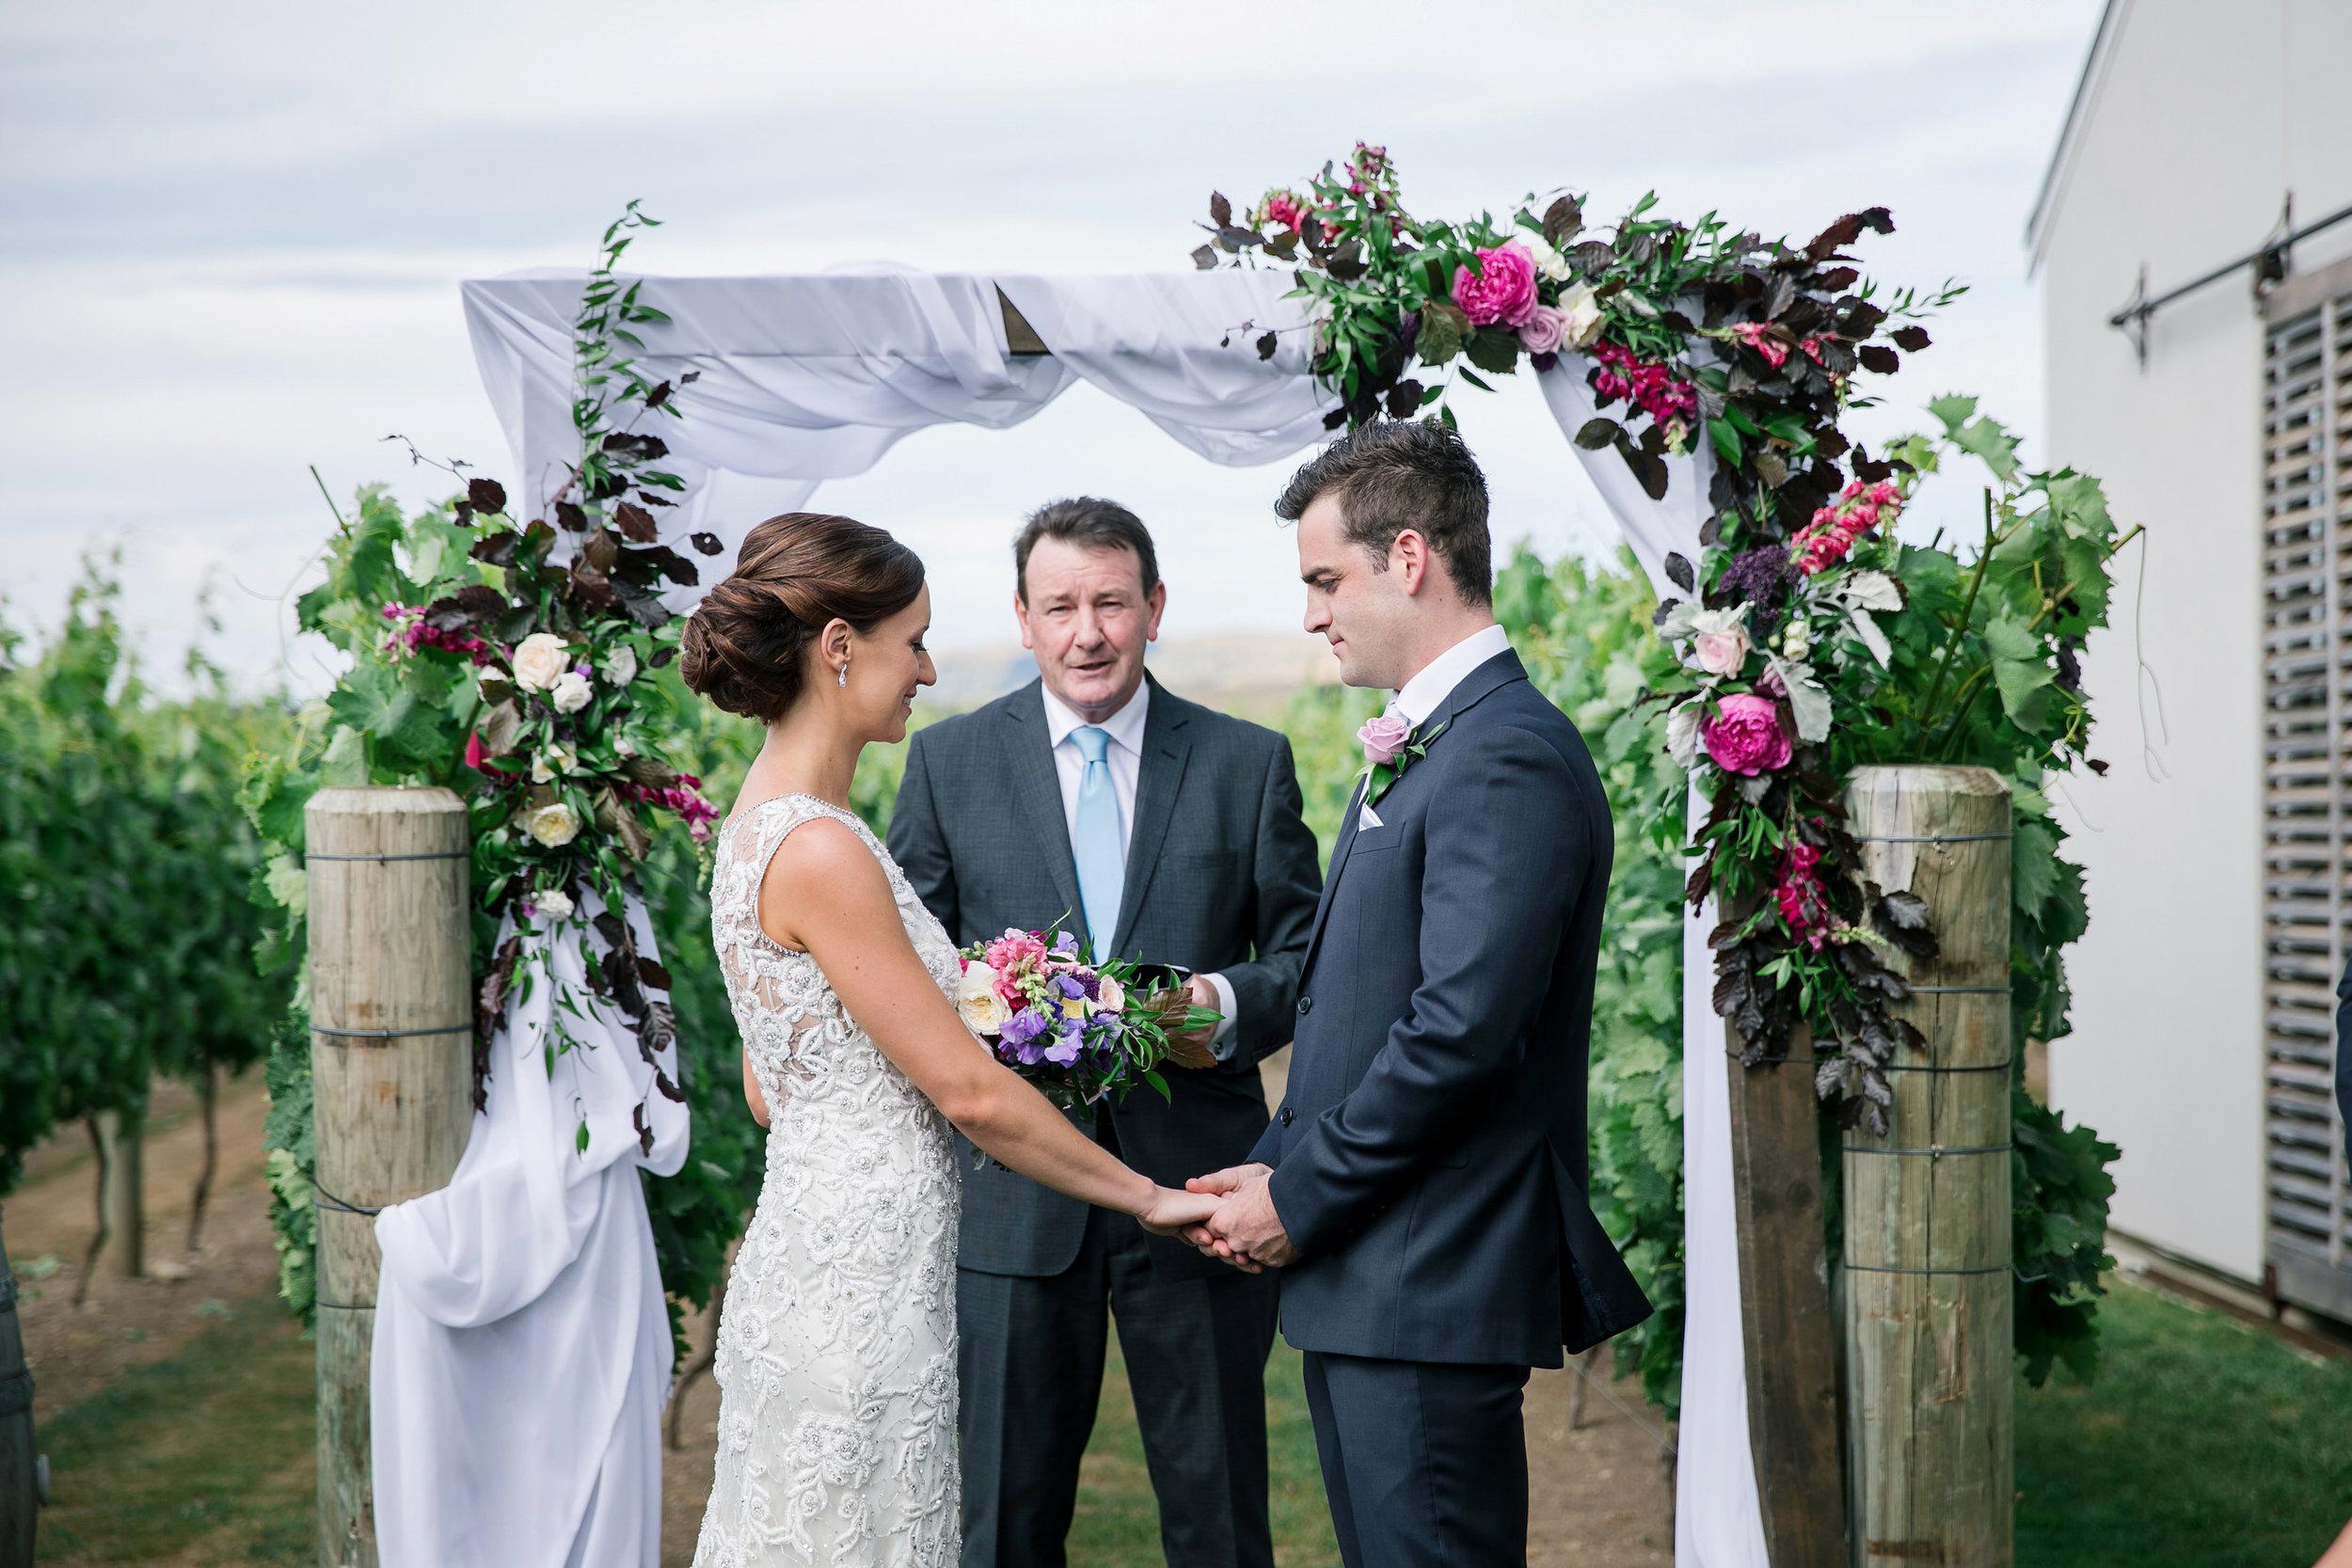 Martinborough-Poppies-Wedding-Caine-Eloise-Toni-Larsen-0085.jpg